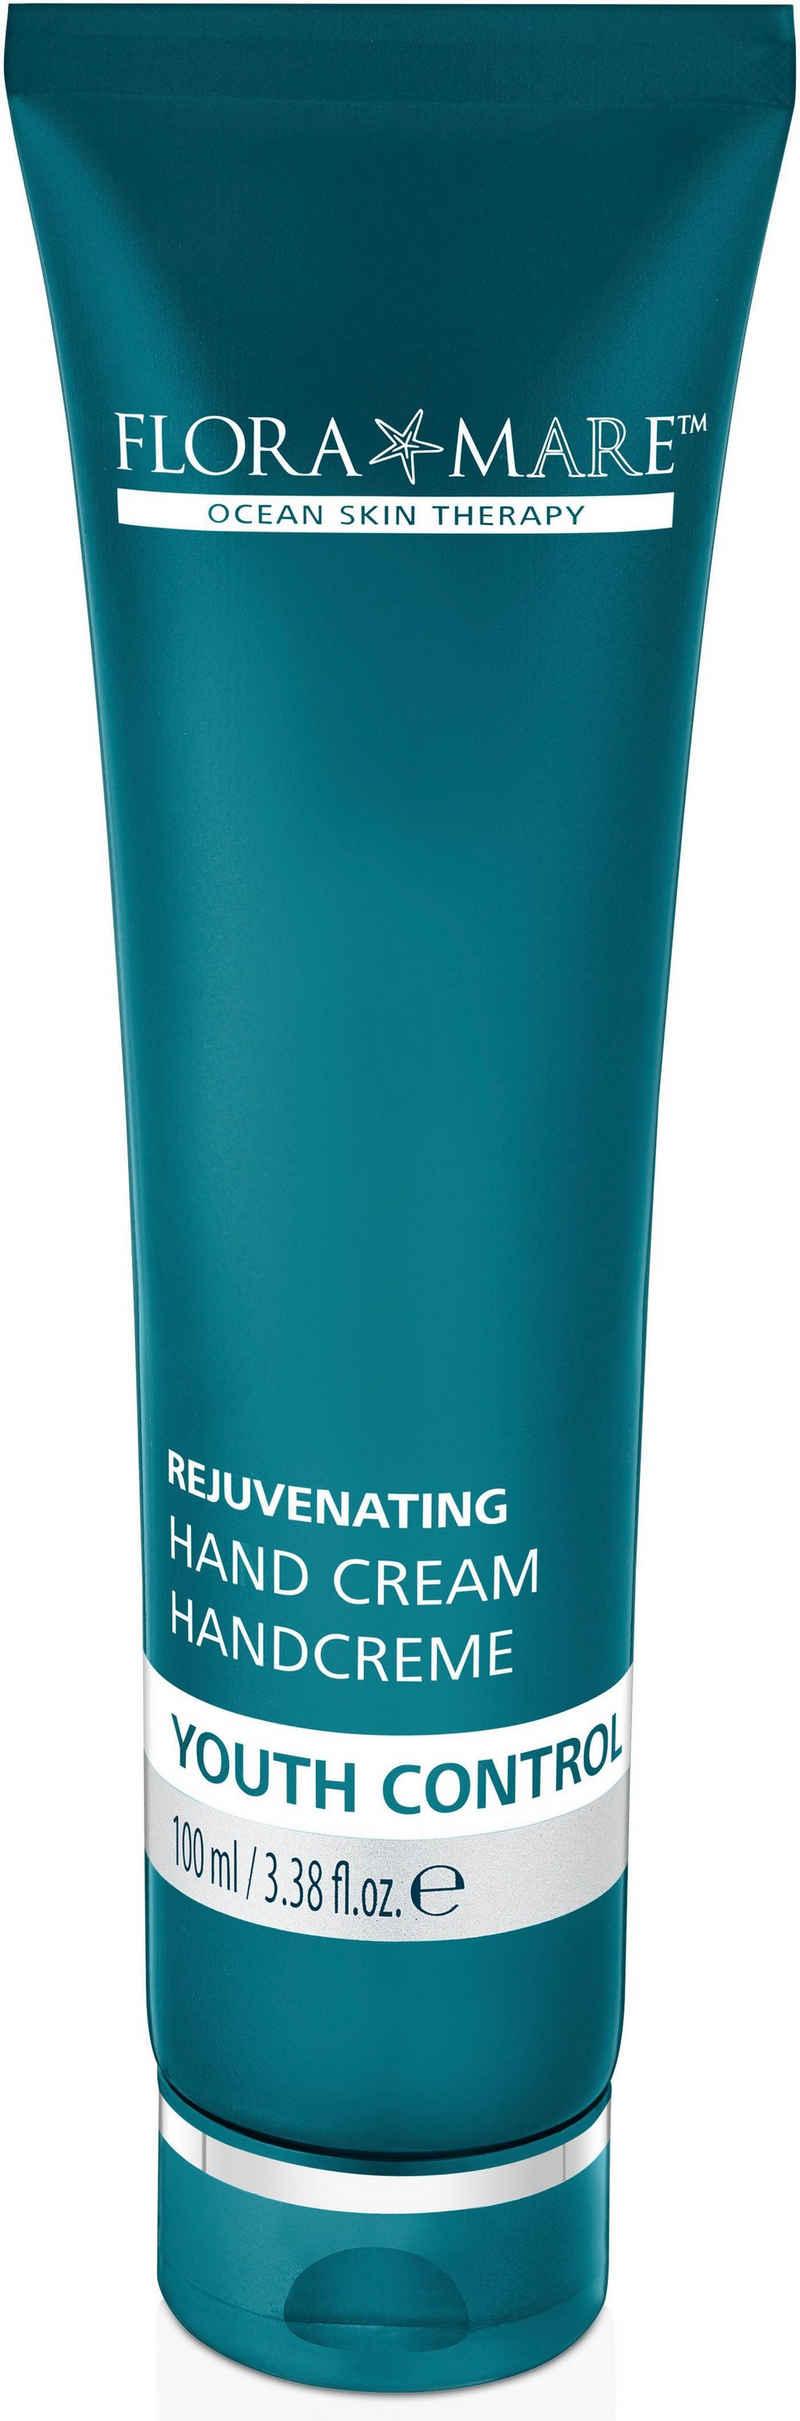 FLORA MARE Handcreme »Youth Control Rejuvenating Hand Cream«